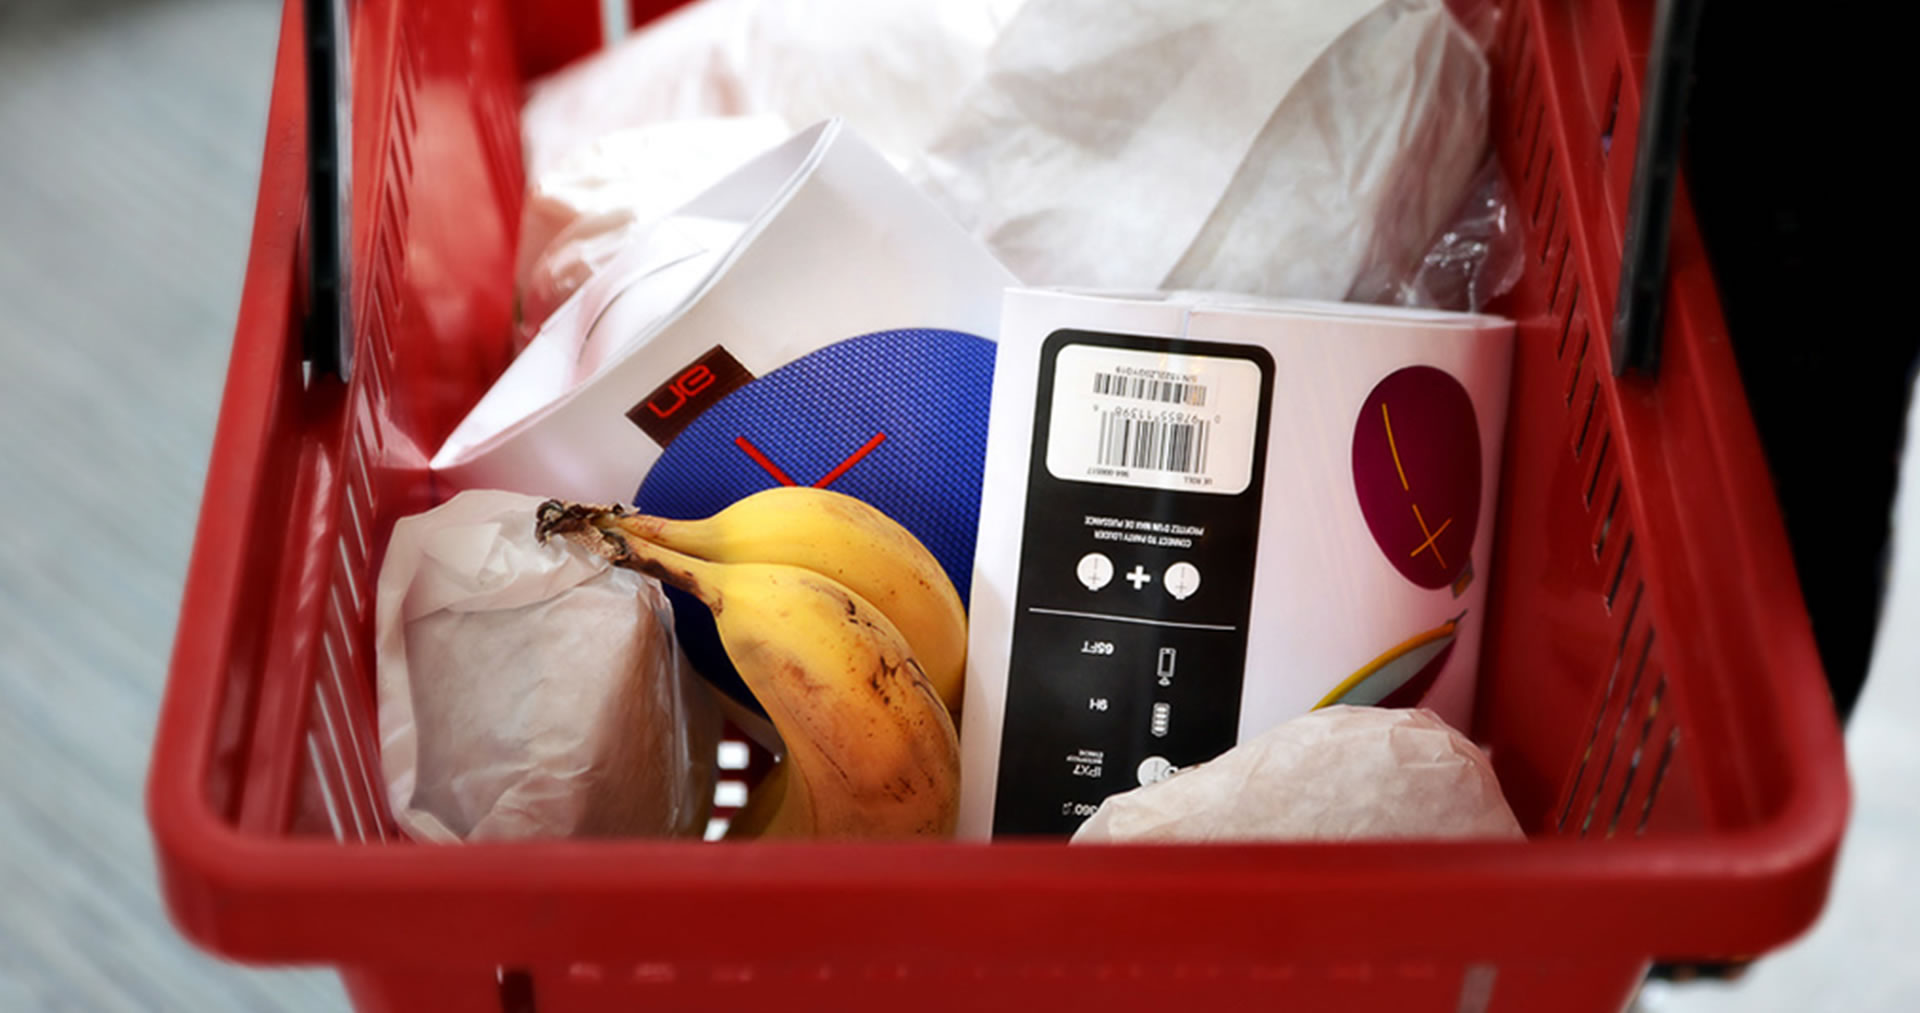 UE Roll portable speaker packaging in a shopping basket